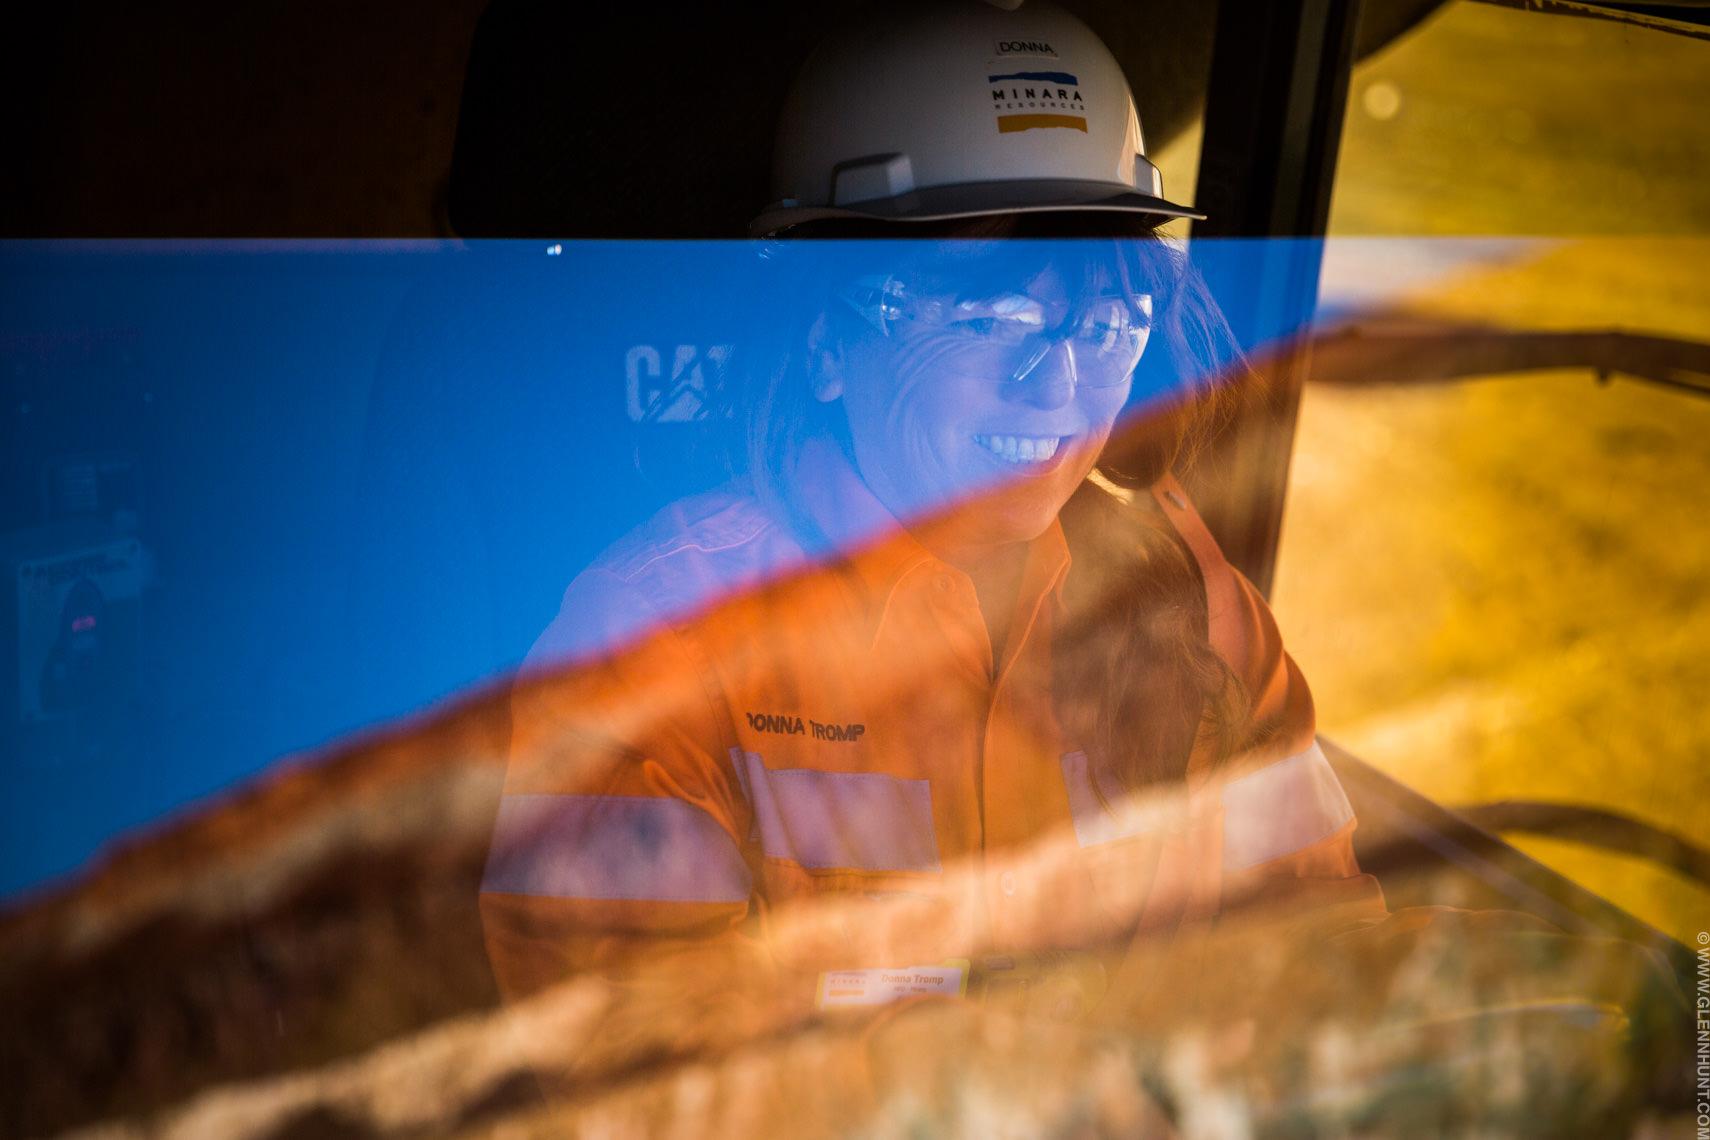 brisbane-queensland-mining-industry-photographer-007